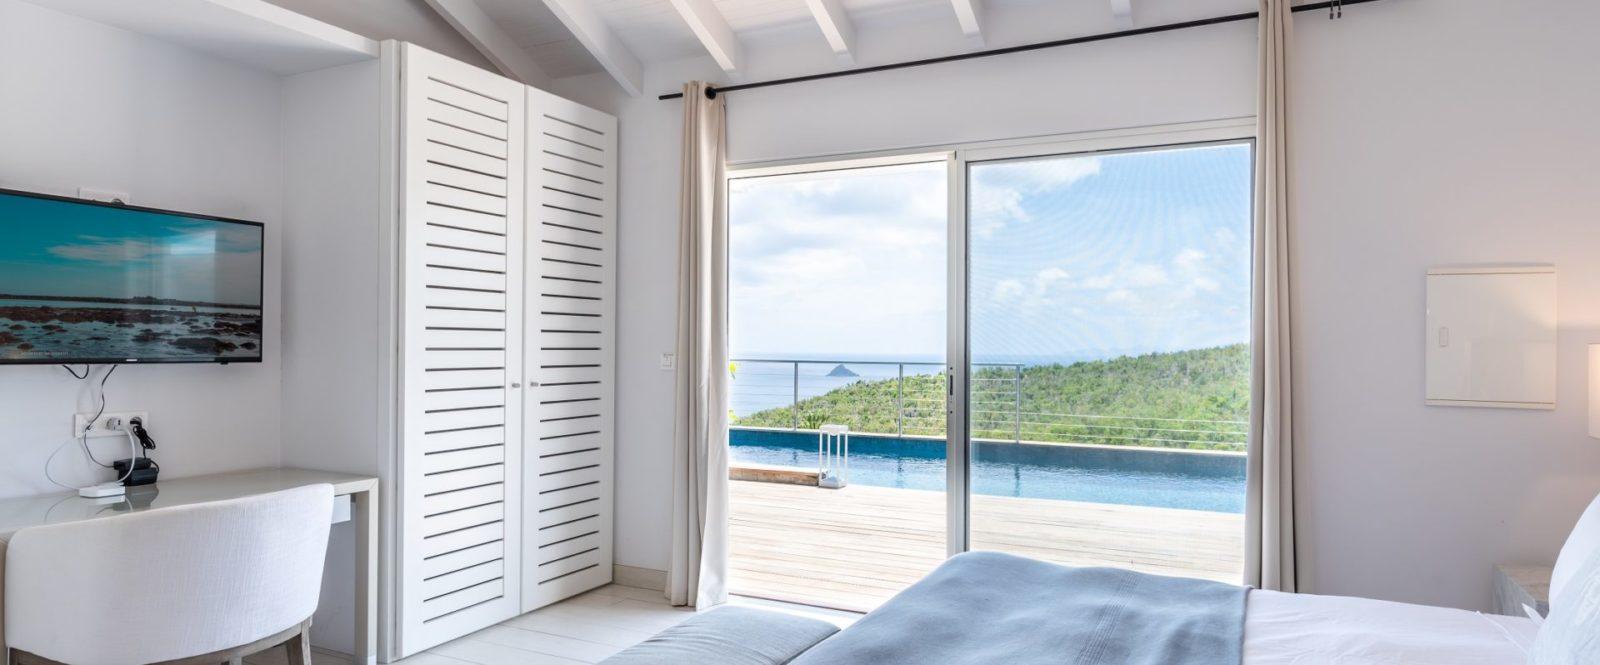 AVALON - villa-avalon-jeanne-le-menn-bedroom-2-2